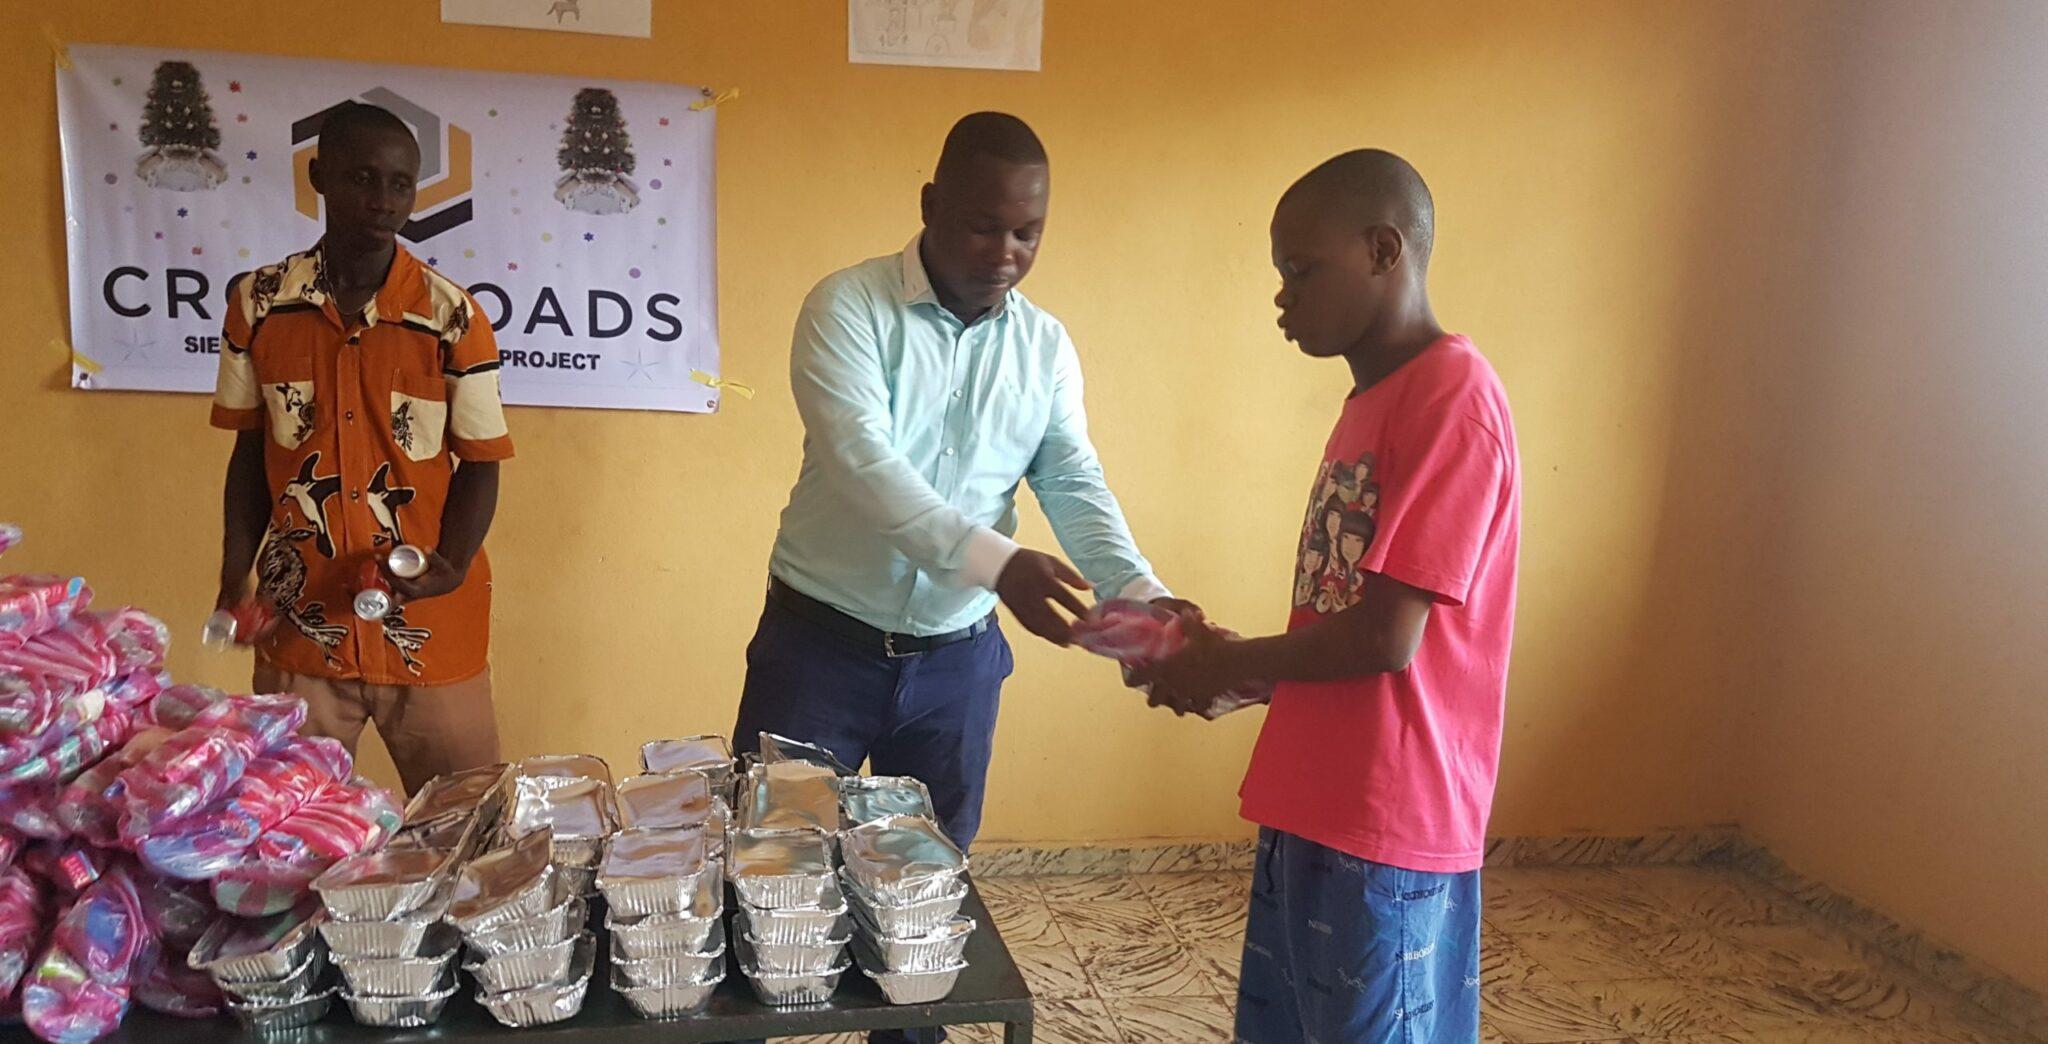 Crossroads Sierra Leone Celebrates Christmas with Children in Prison